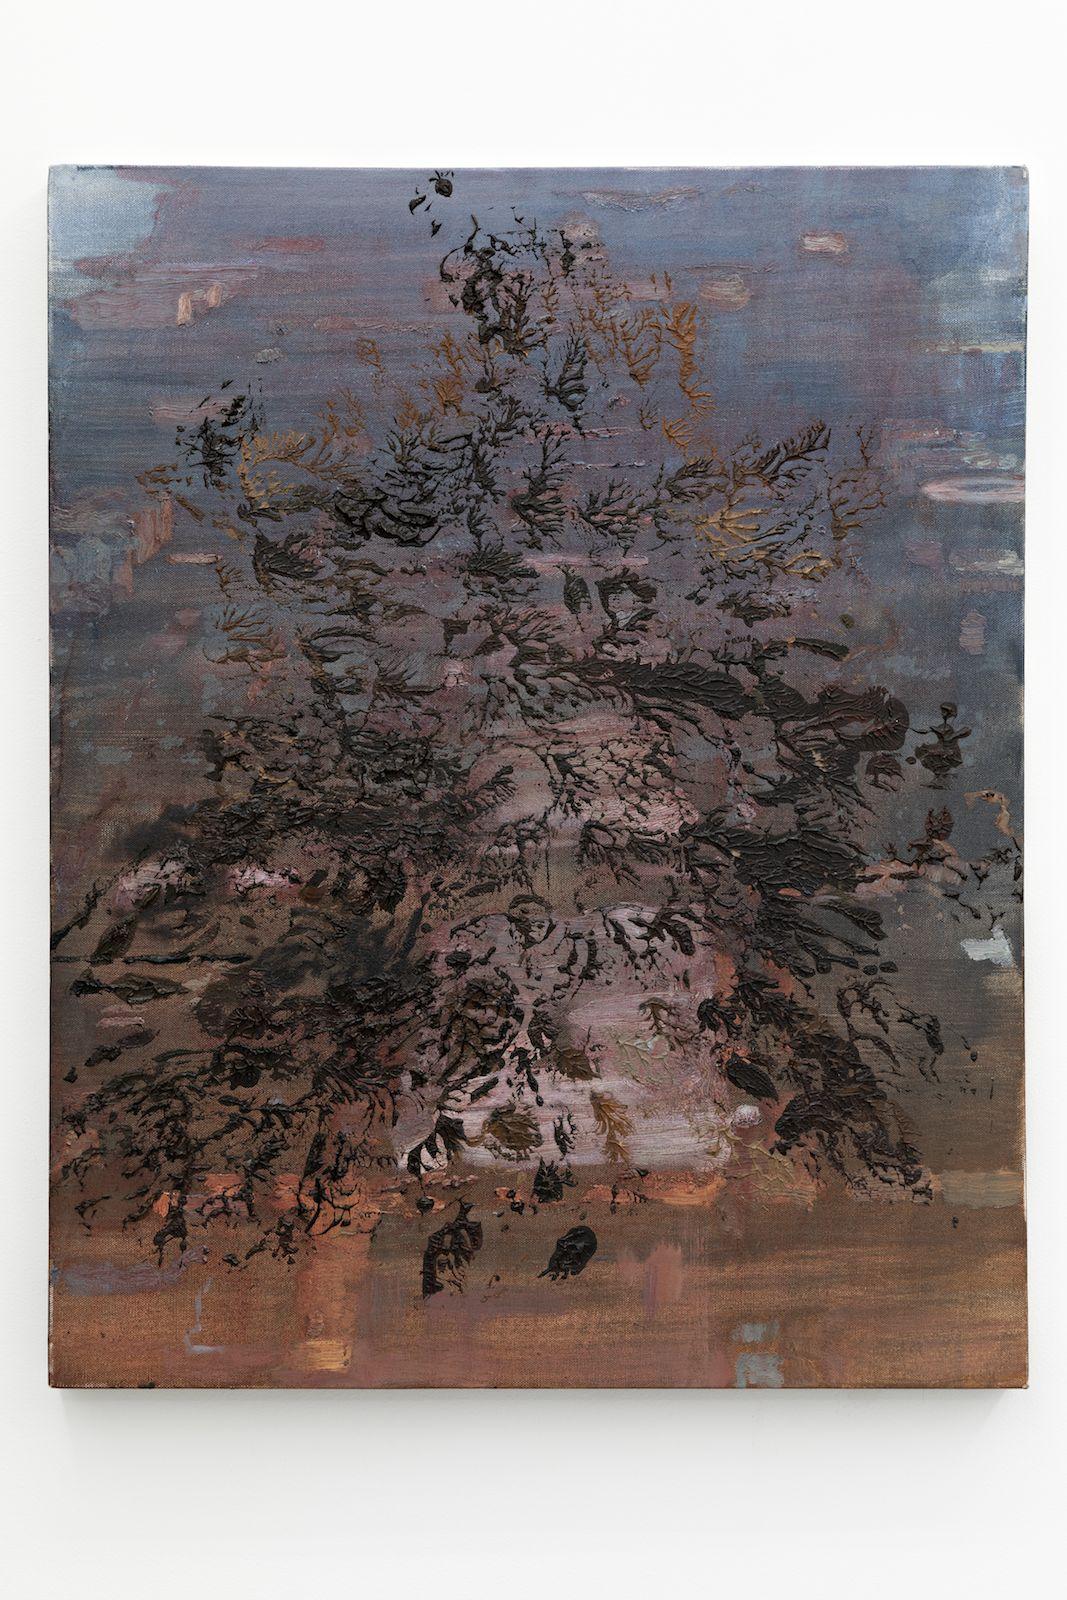 Zeroandones III, 2018. Oil on canvas, 76 x 61 cm